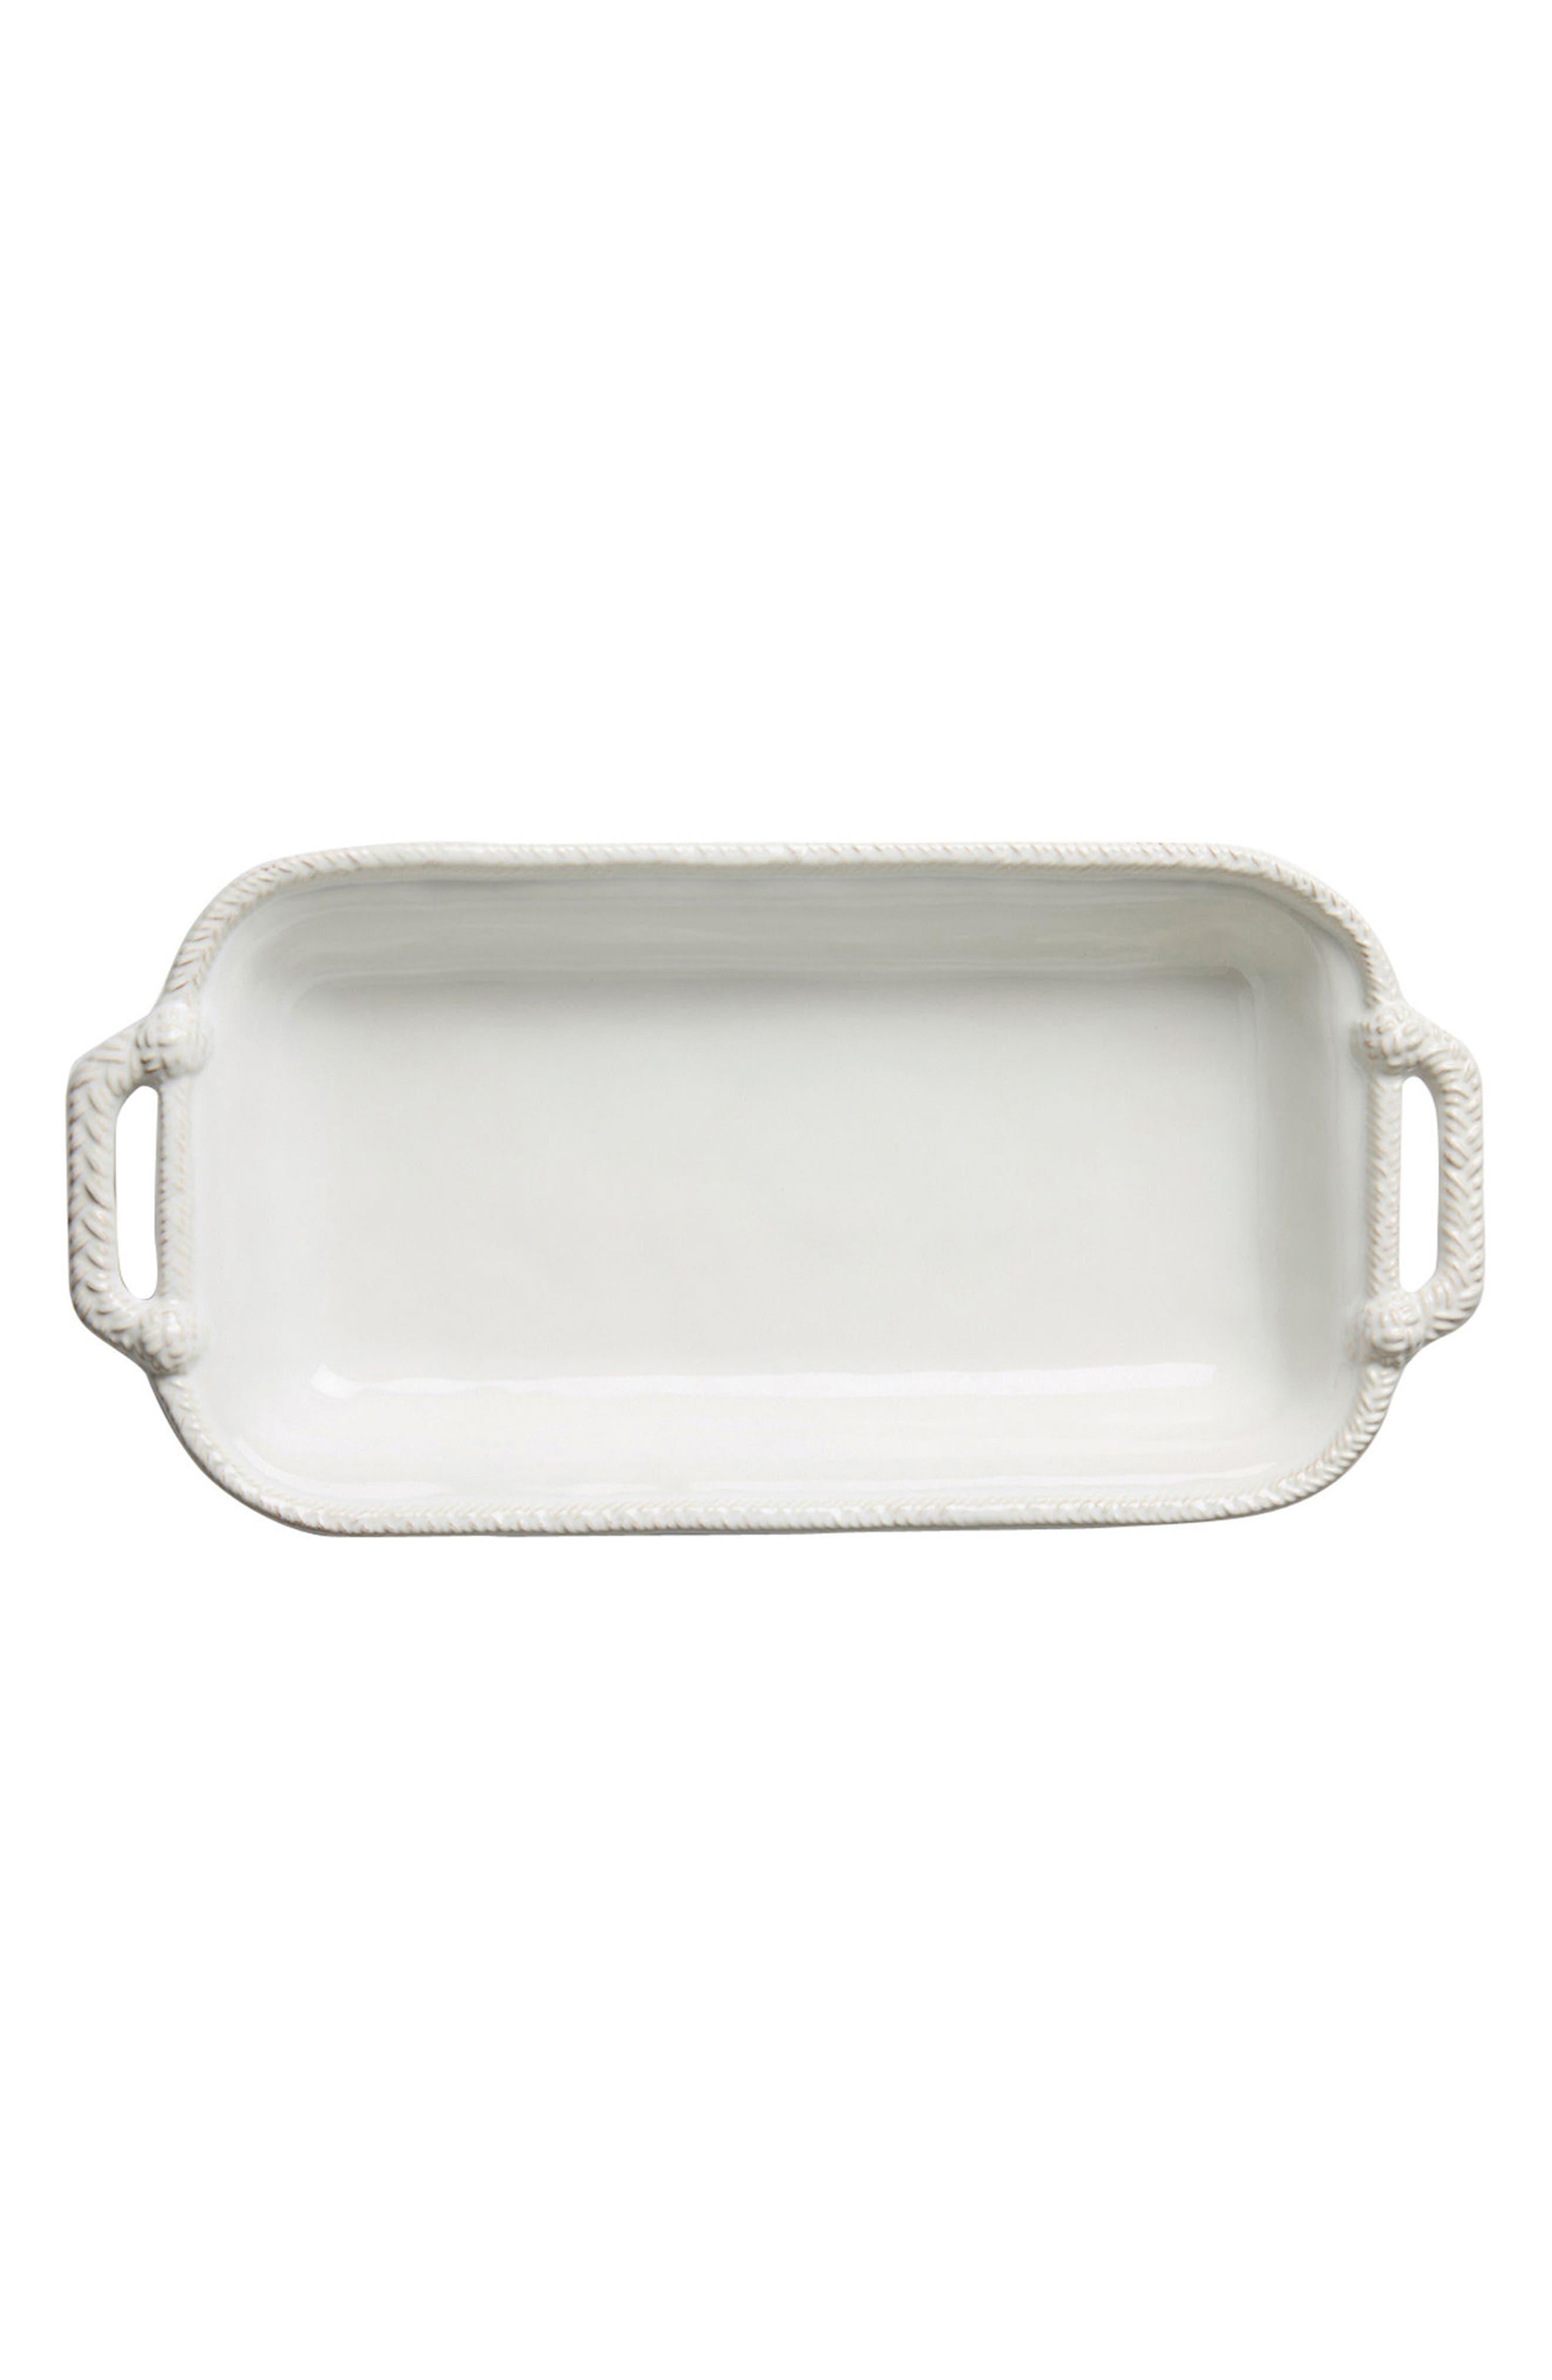 Juliska Le Panier 2-Quart Rectangular Baking Dish